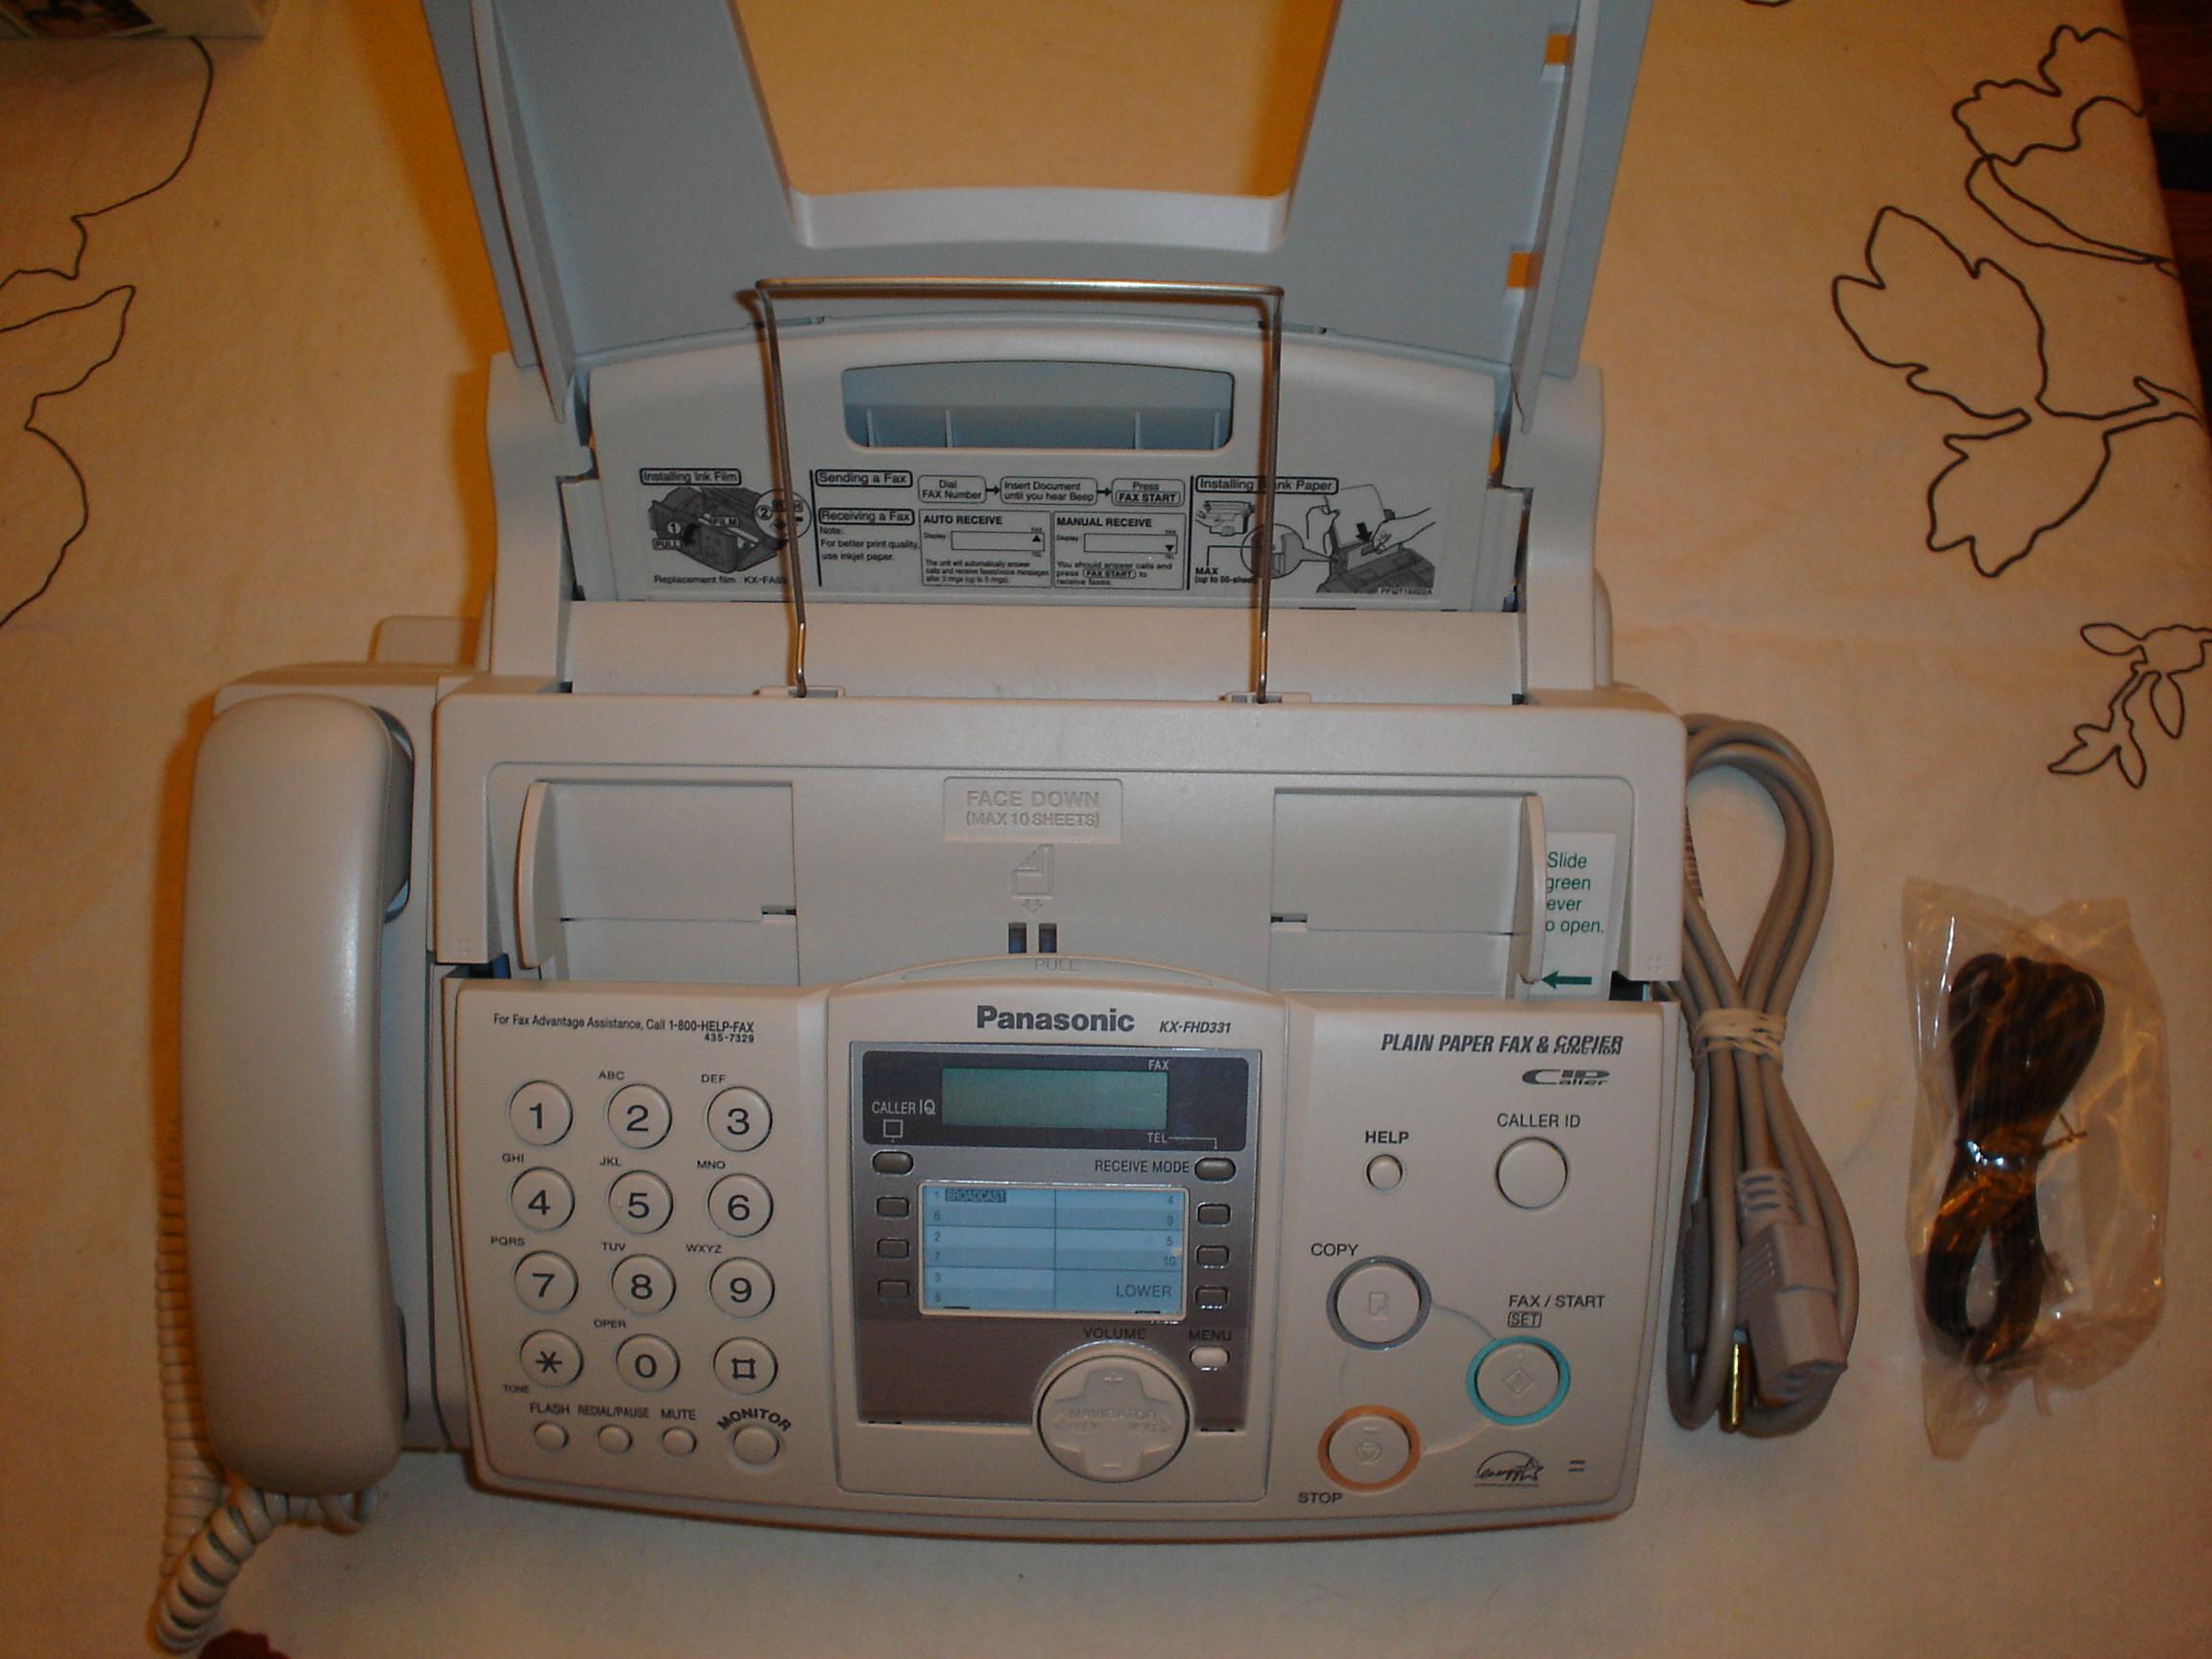 panasonic fax machine kx fhd331 in bargain basement s yard sale rh garagesalehomepage com Panasonic Kx Fhd331 Fax Copier Panasonic Kx Fhd331 Film